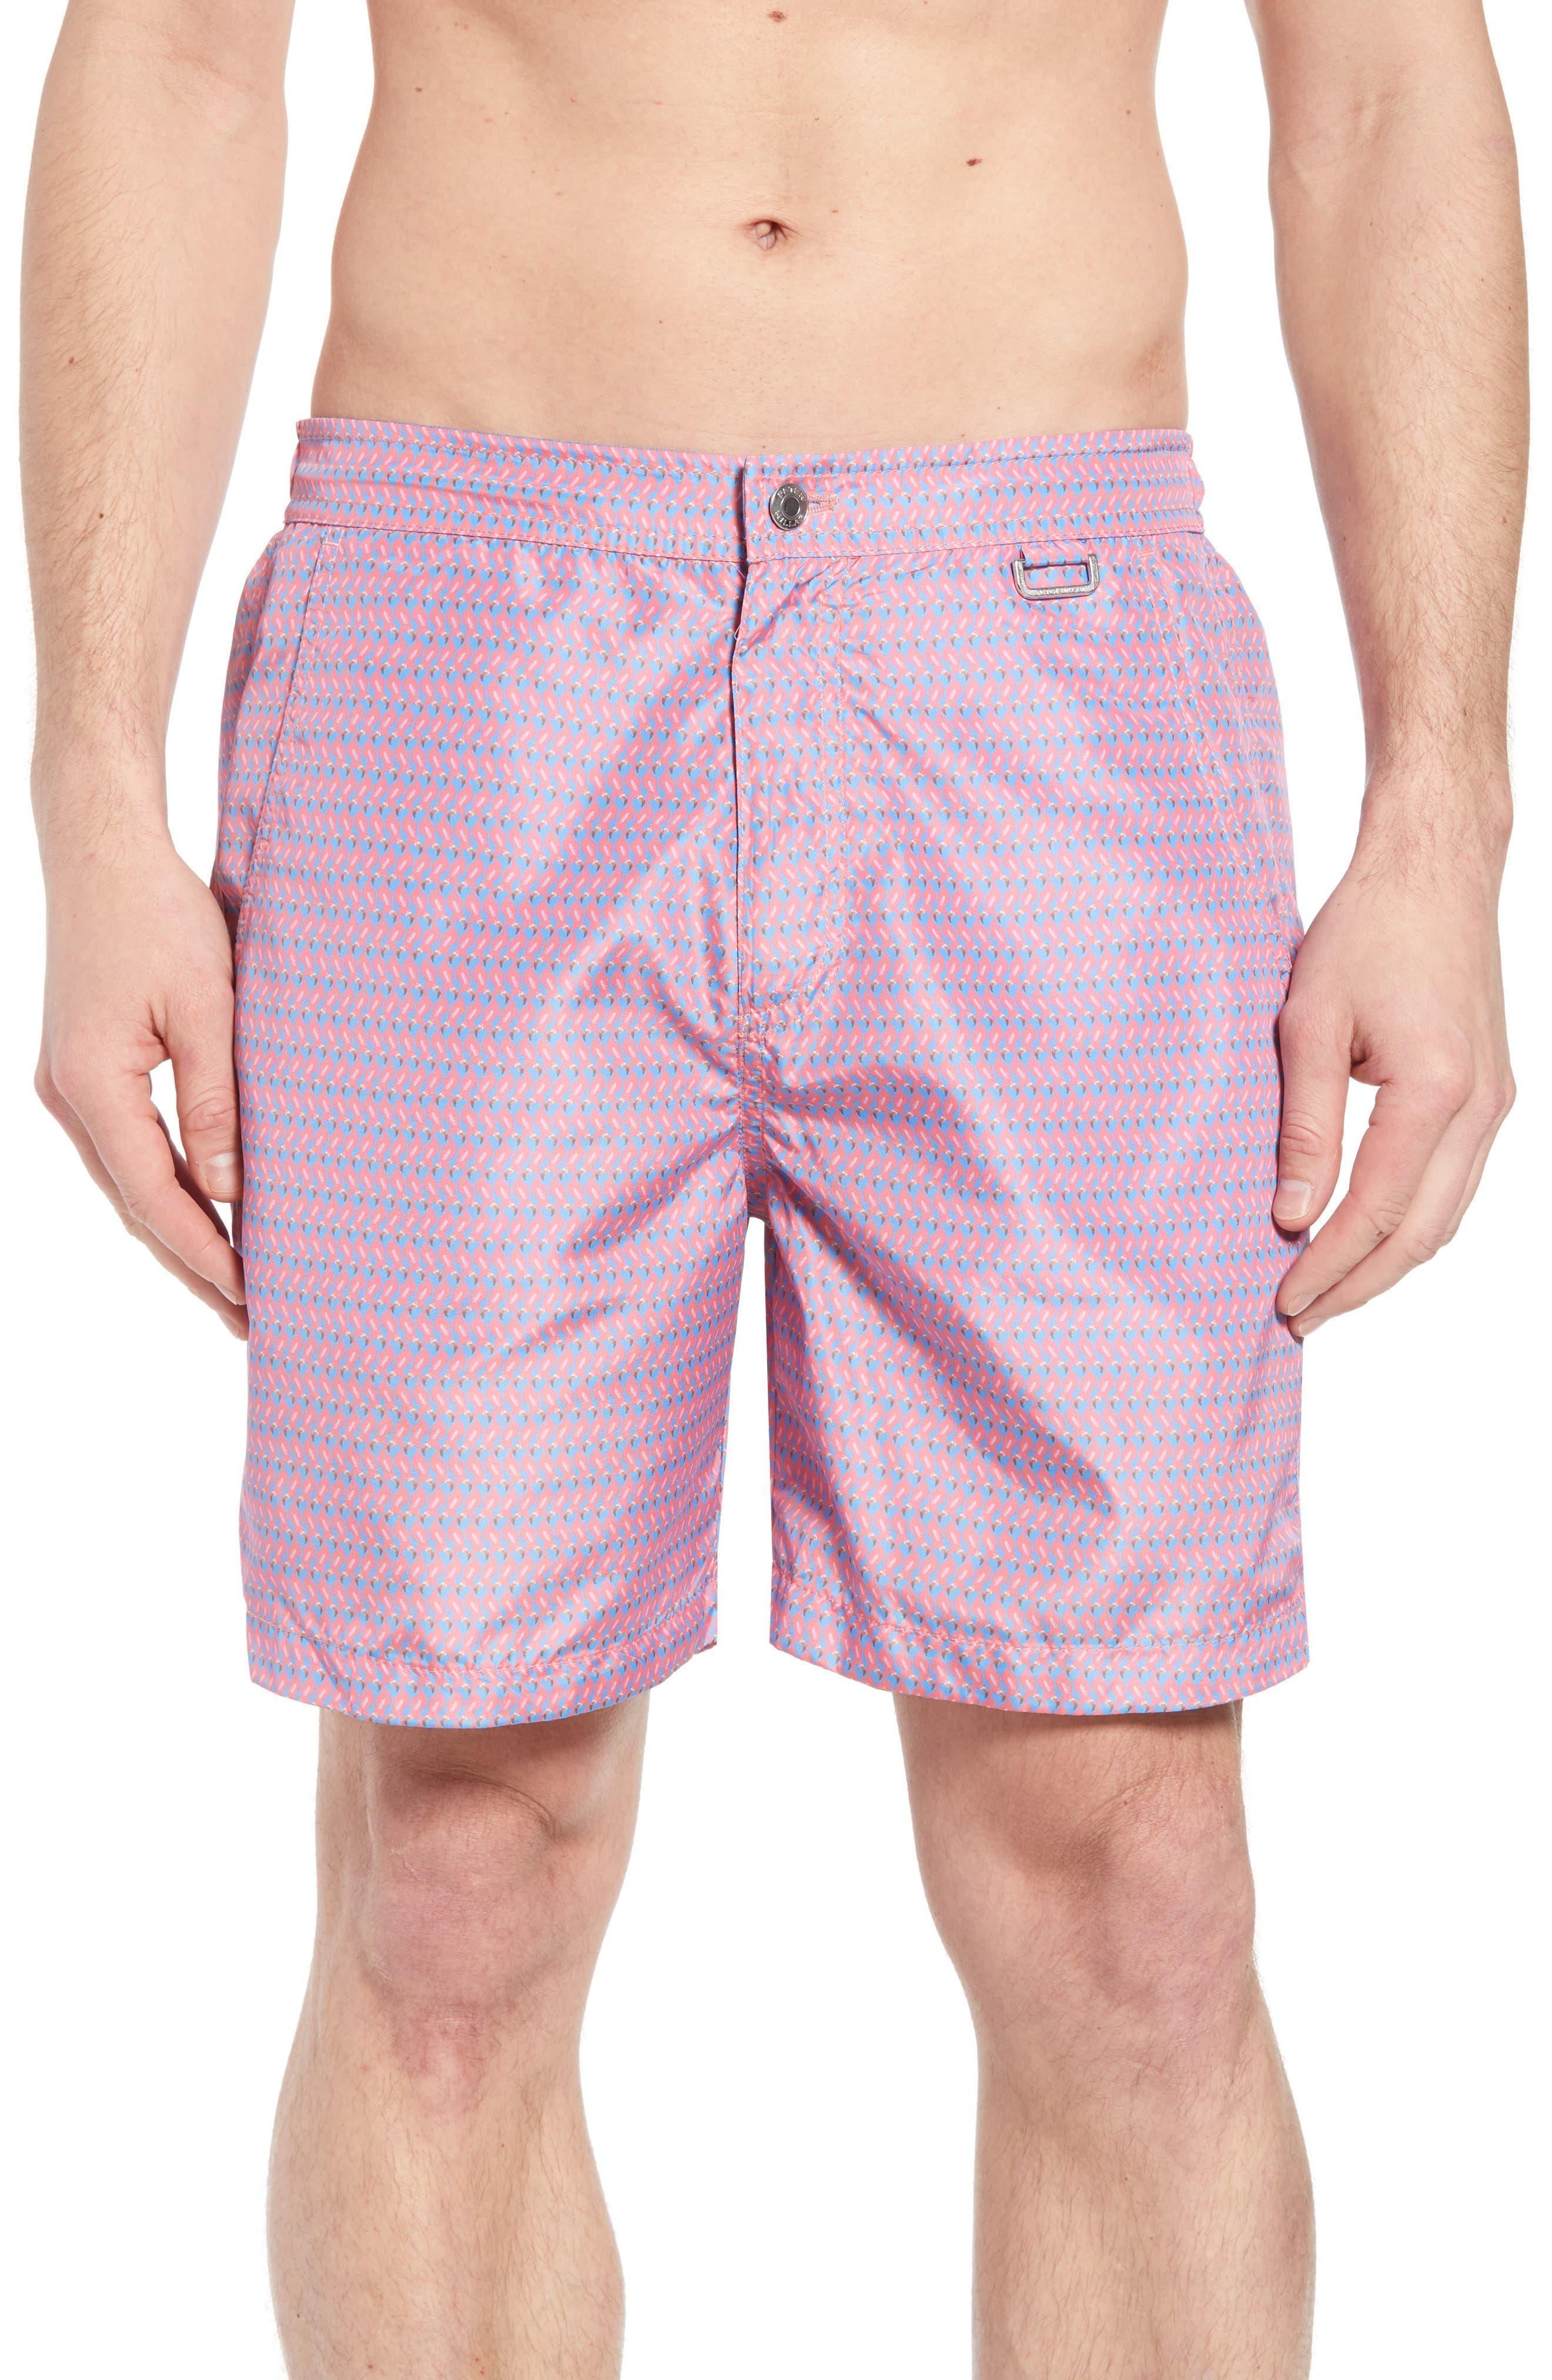 Wakka Flokka Flamingos Swim Trunks,                         Main,                         color,